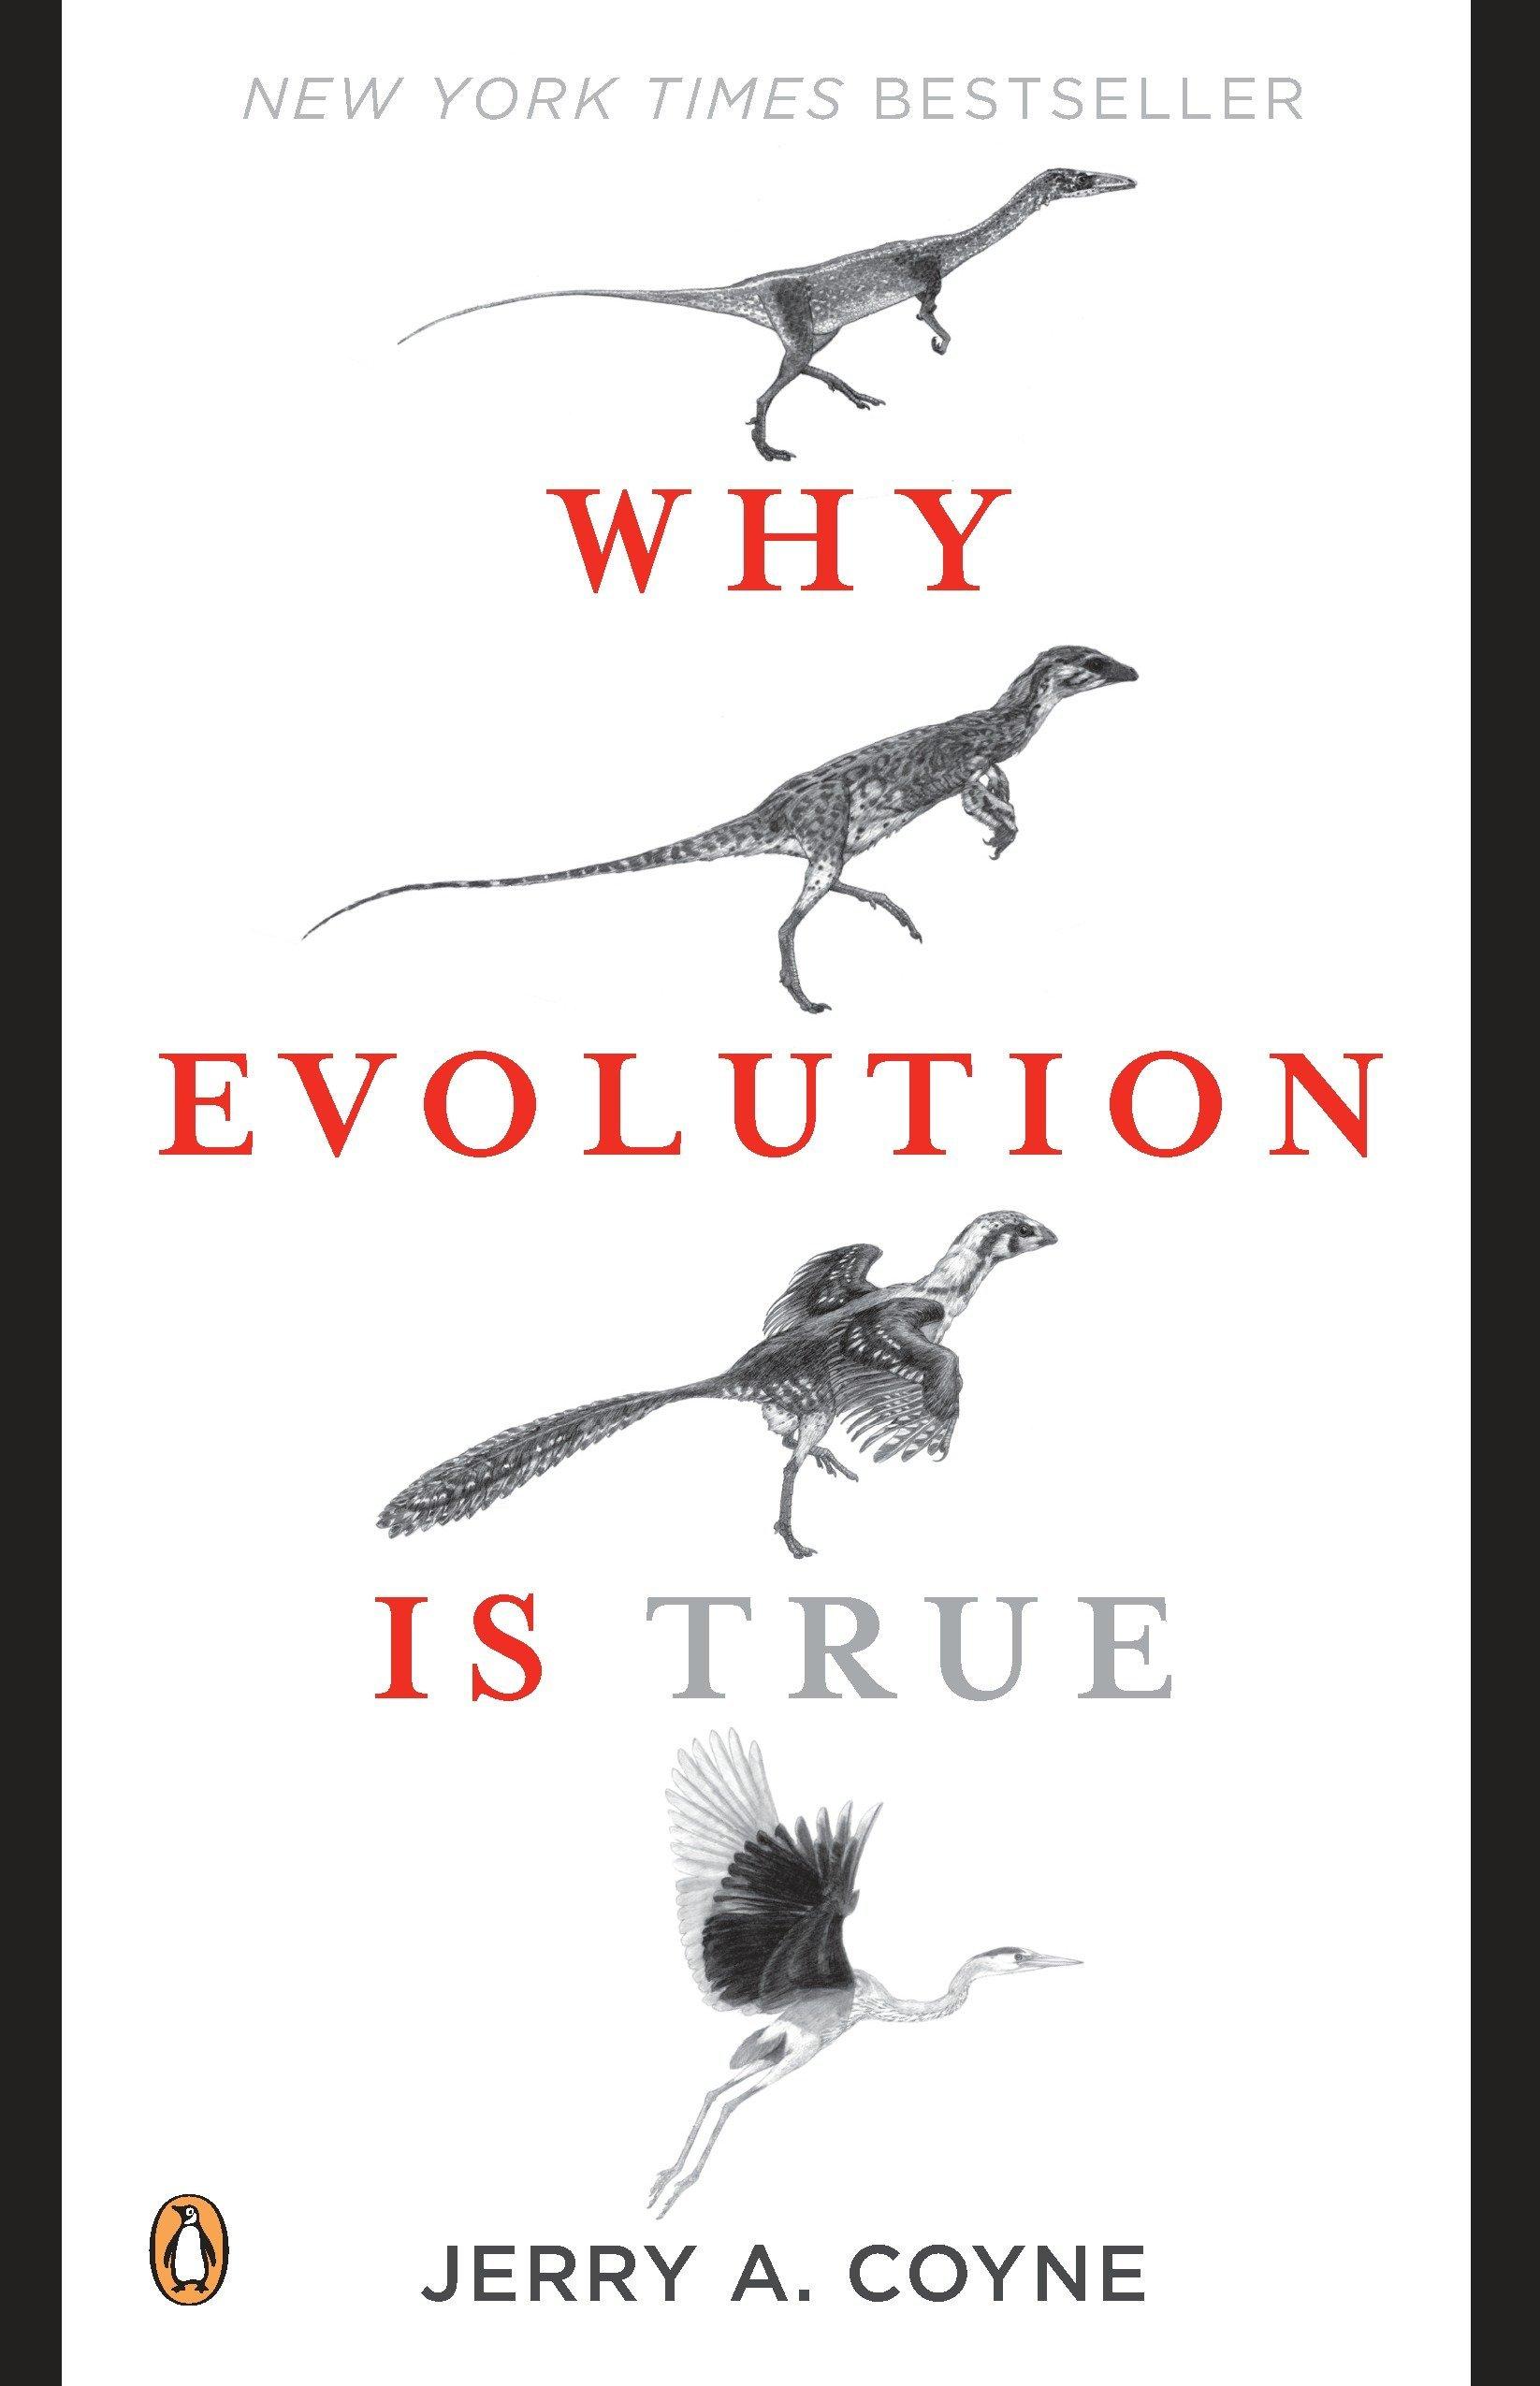 Why Evolution Is True: Coyne, Jerry A.: 8601400309193: Amazon.com: Books